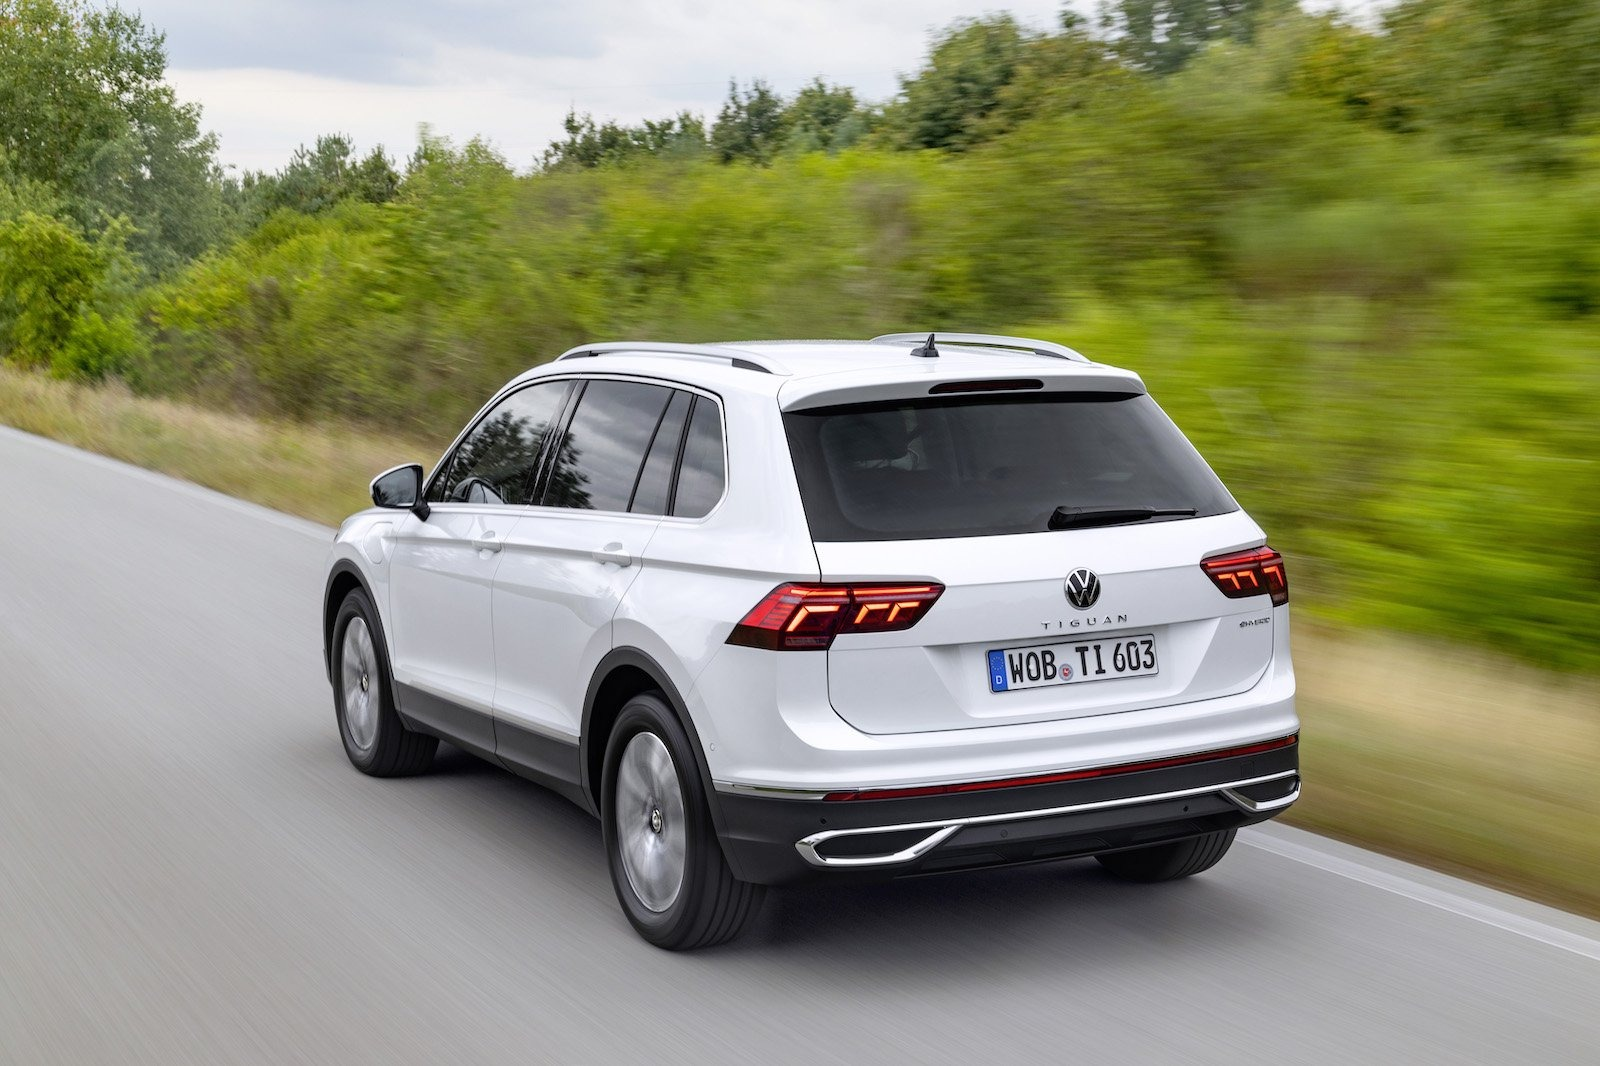 2023 VW Tiguan Images